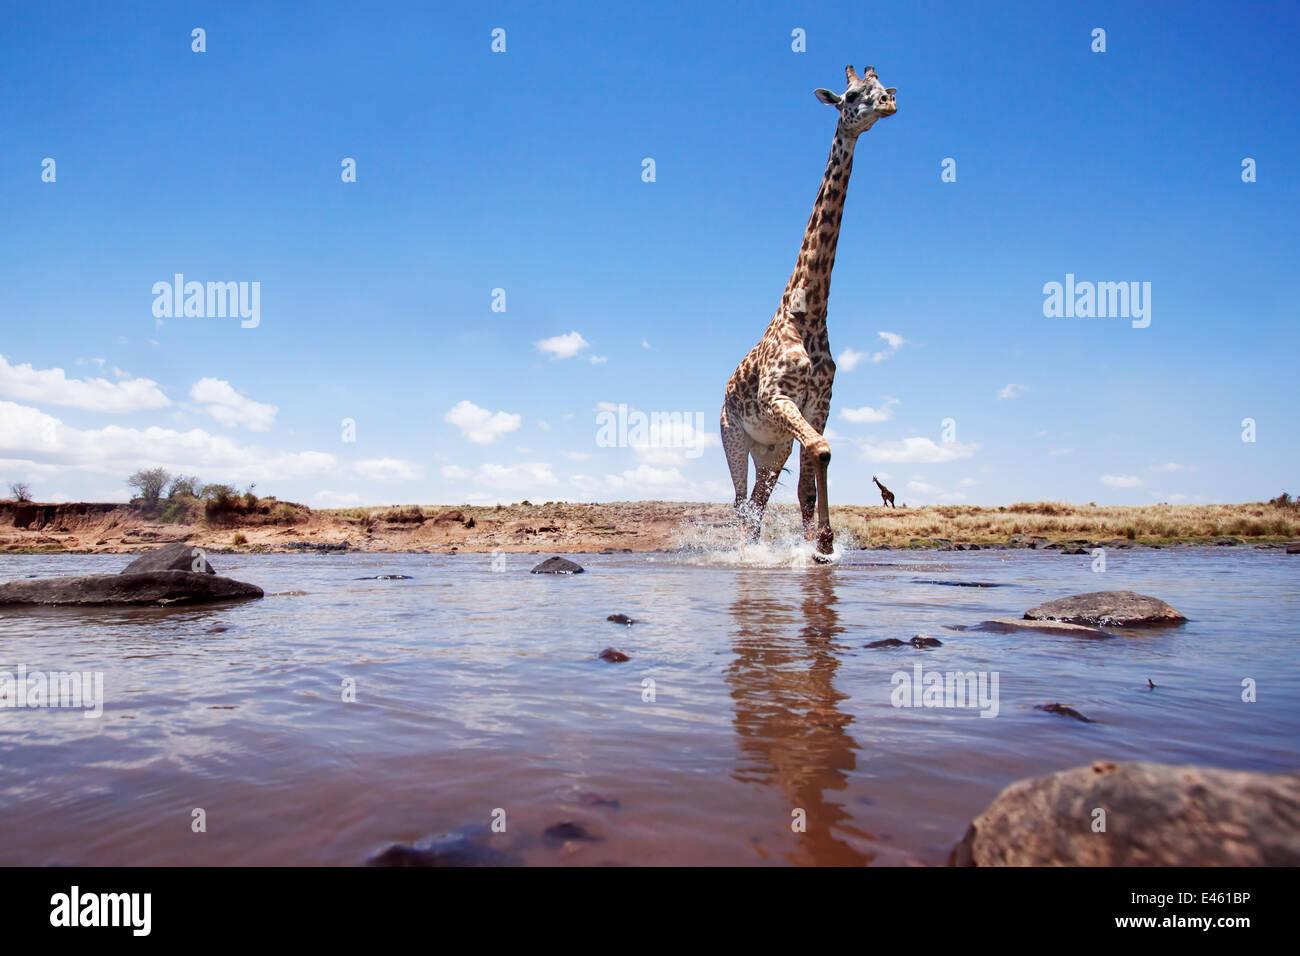 Masai giraffe (Giraffa camelopardalis tippelskirchi) crossing the Mara River - wide angle perspective, Masai Mara - Stock Image